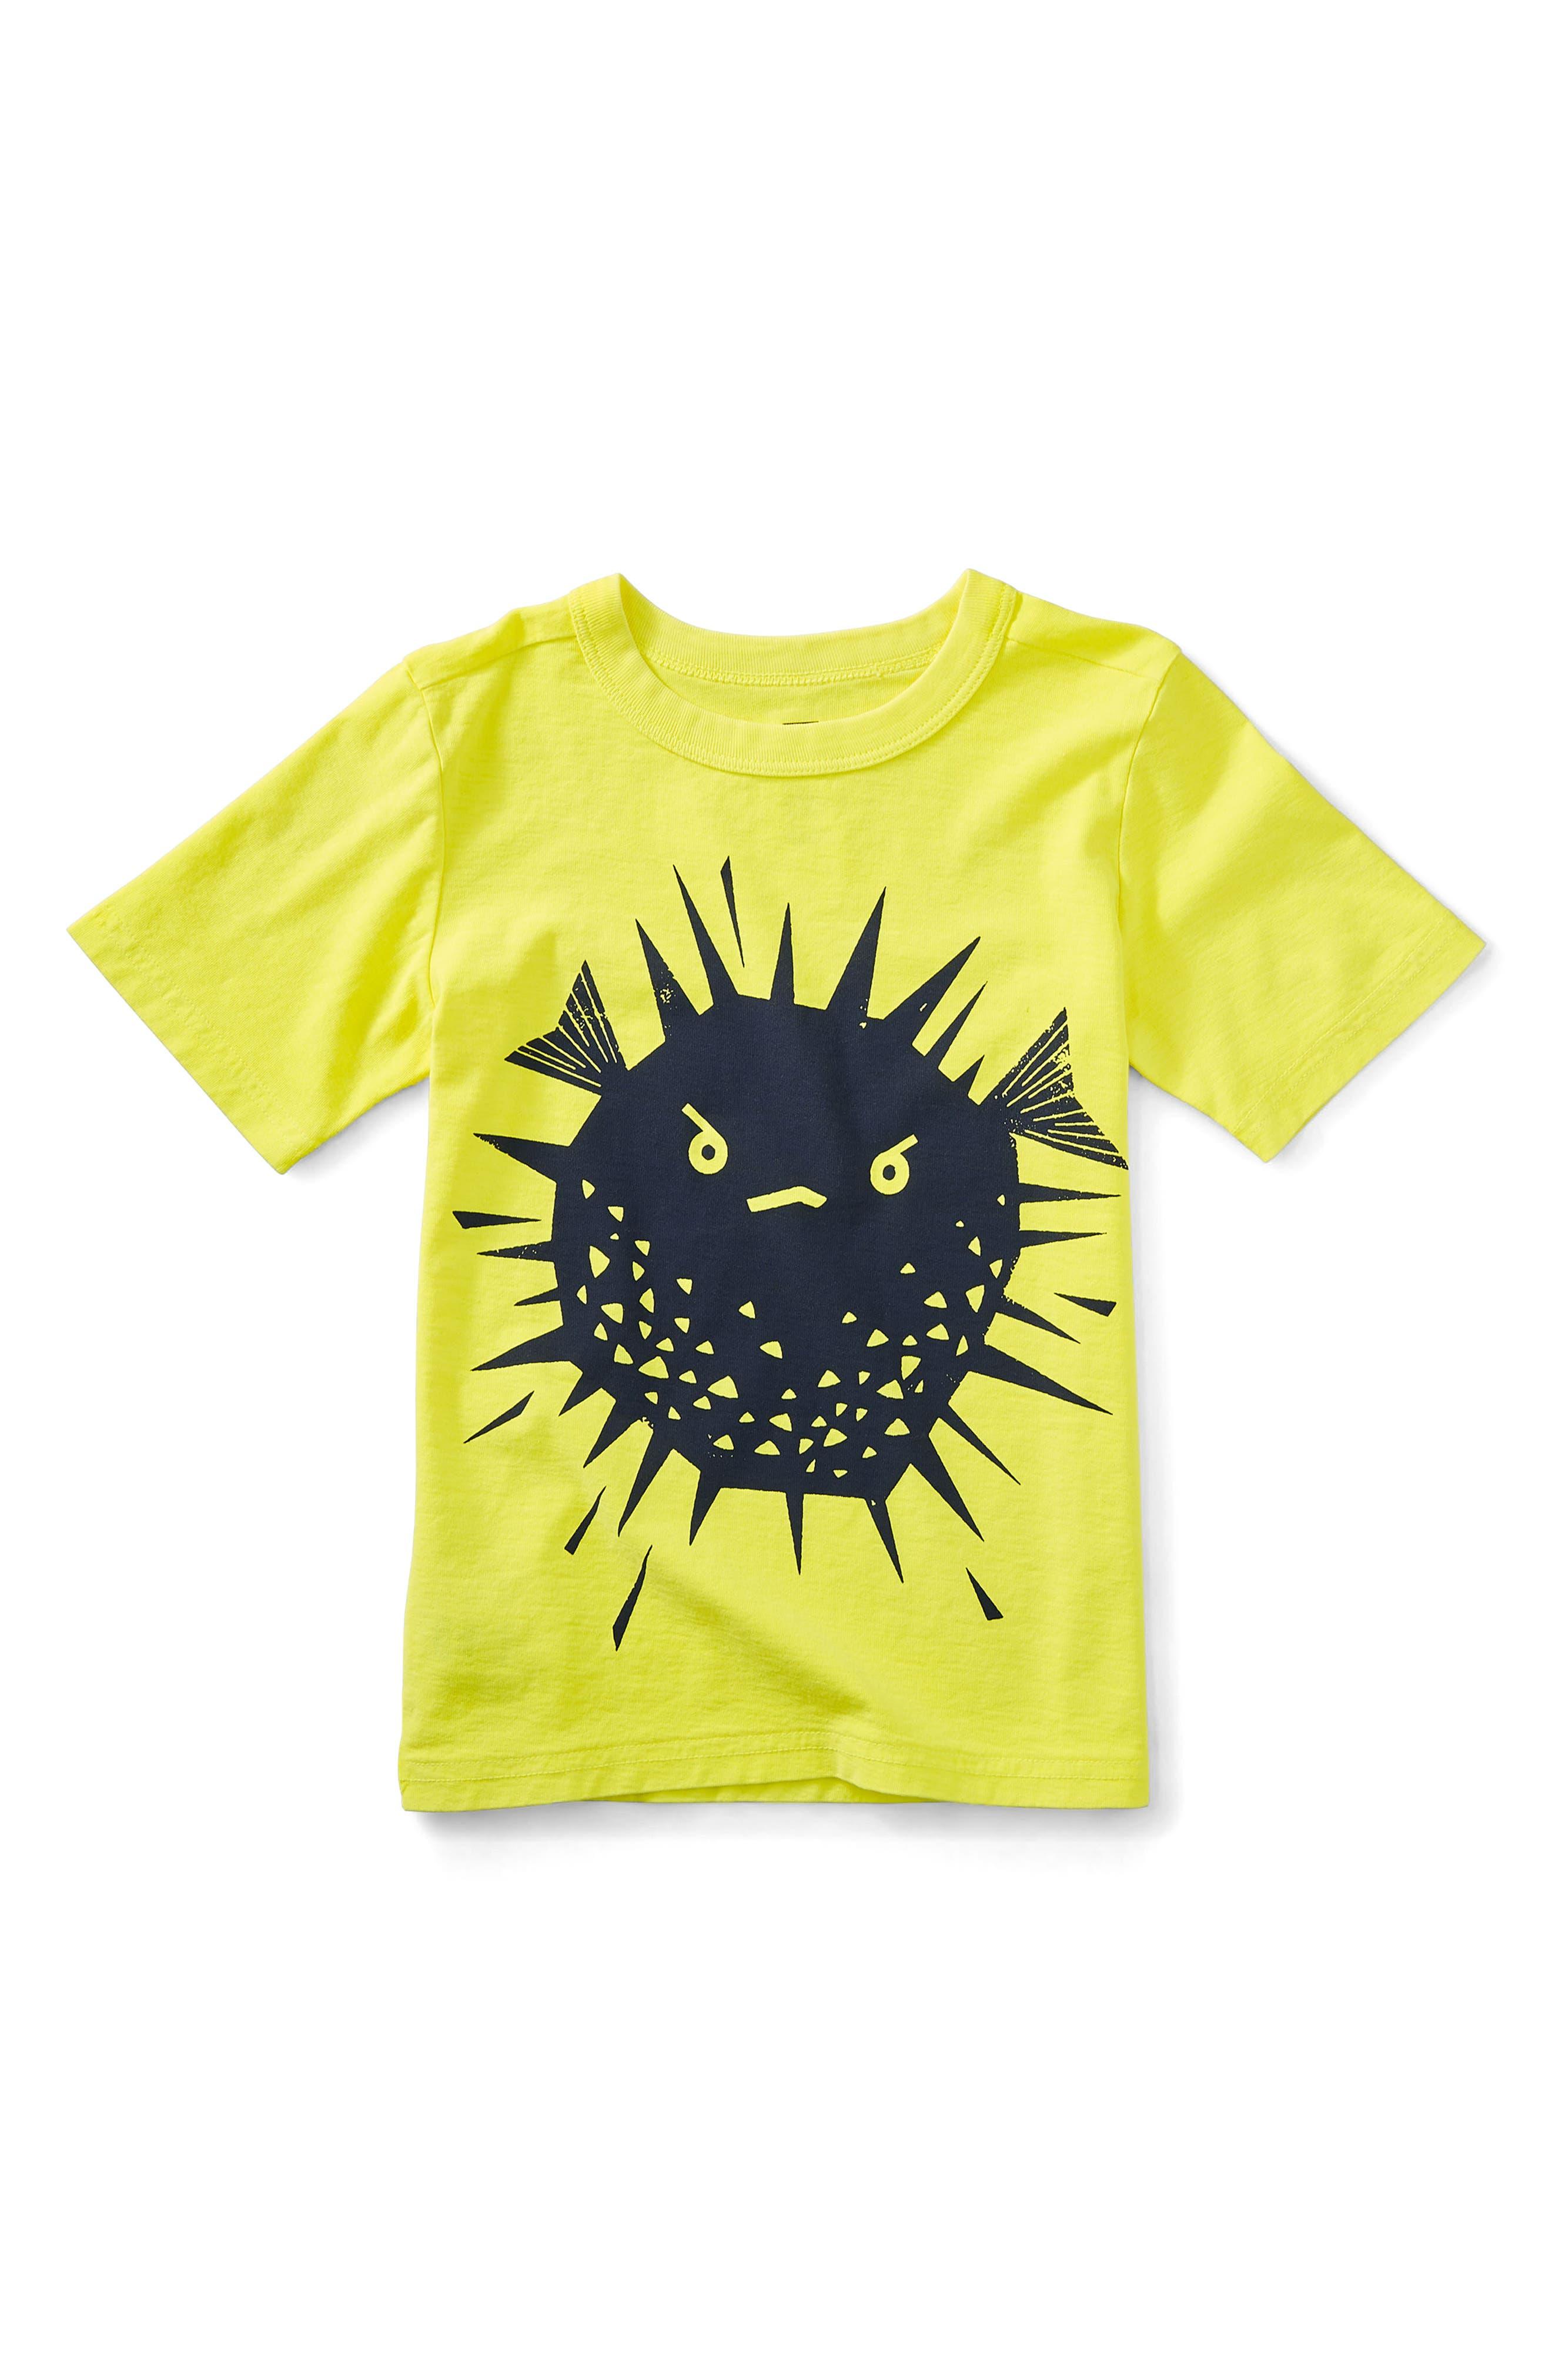 Puffer Fish Graphic T-Shirt,                         Main,                         color, Neon Yellow